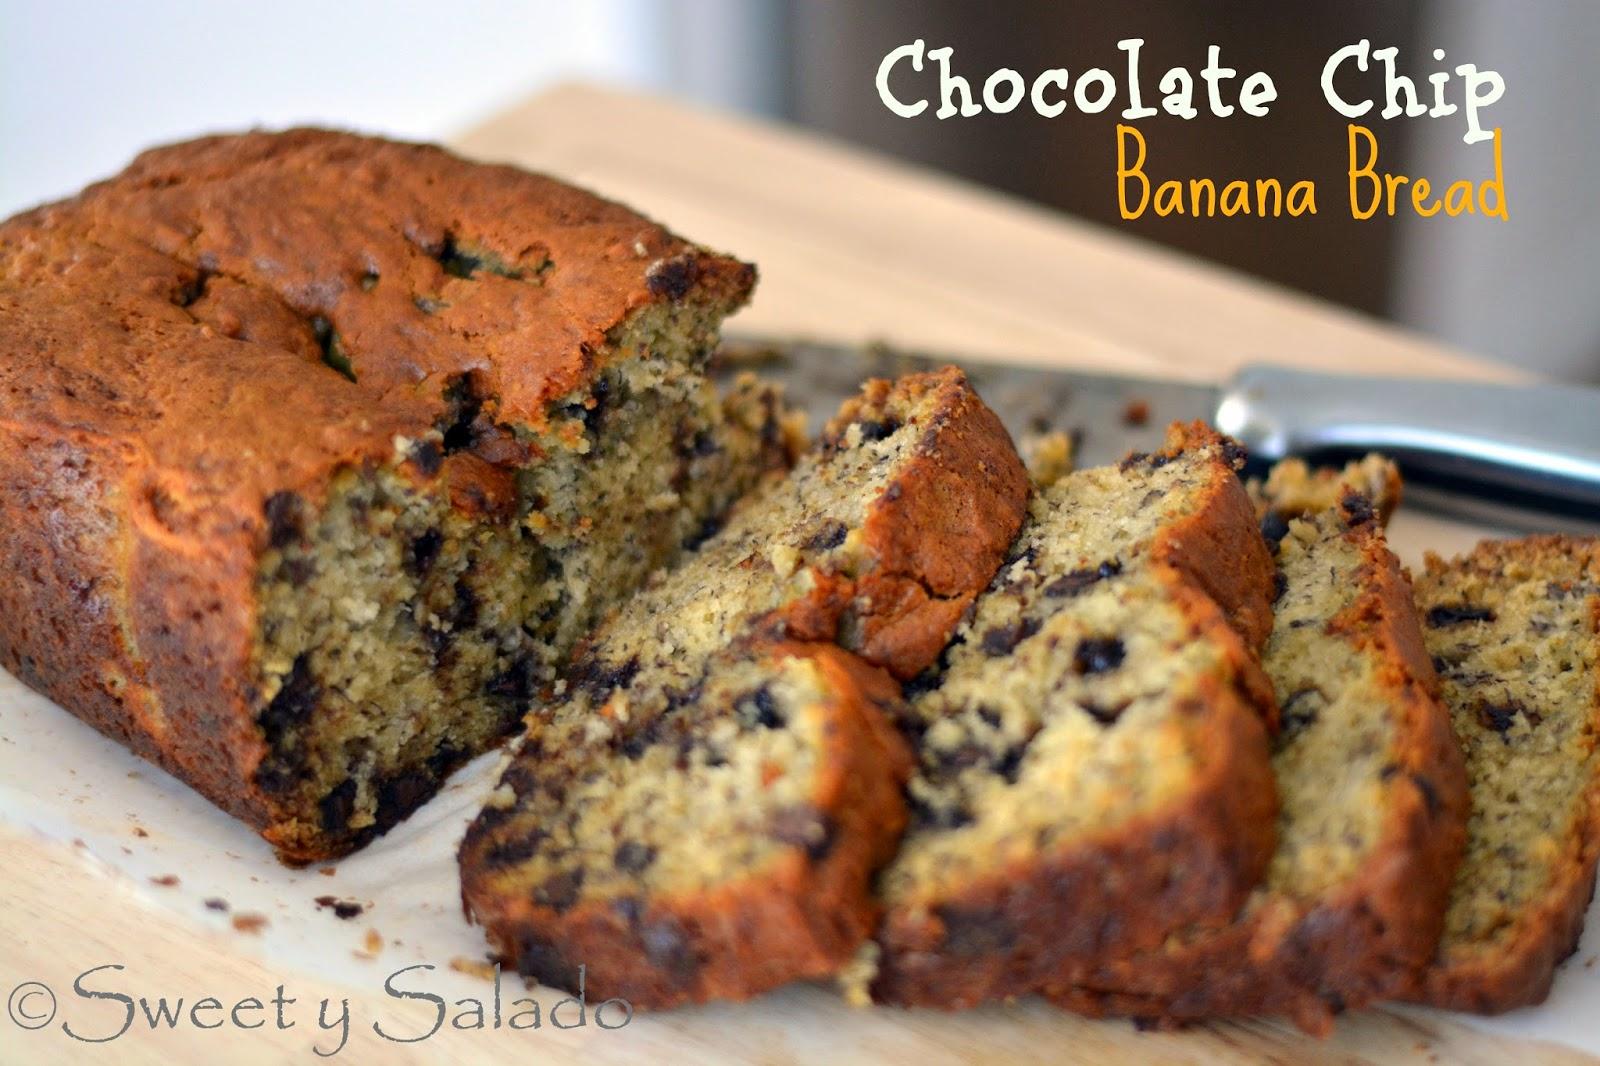 Sweet y Salado: Chocolate Chip Banana Bread